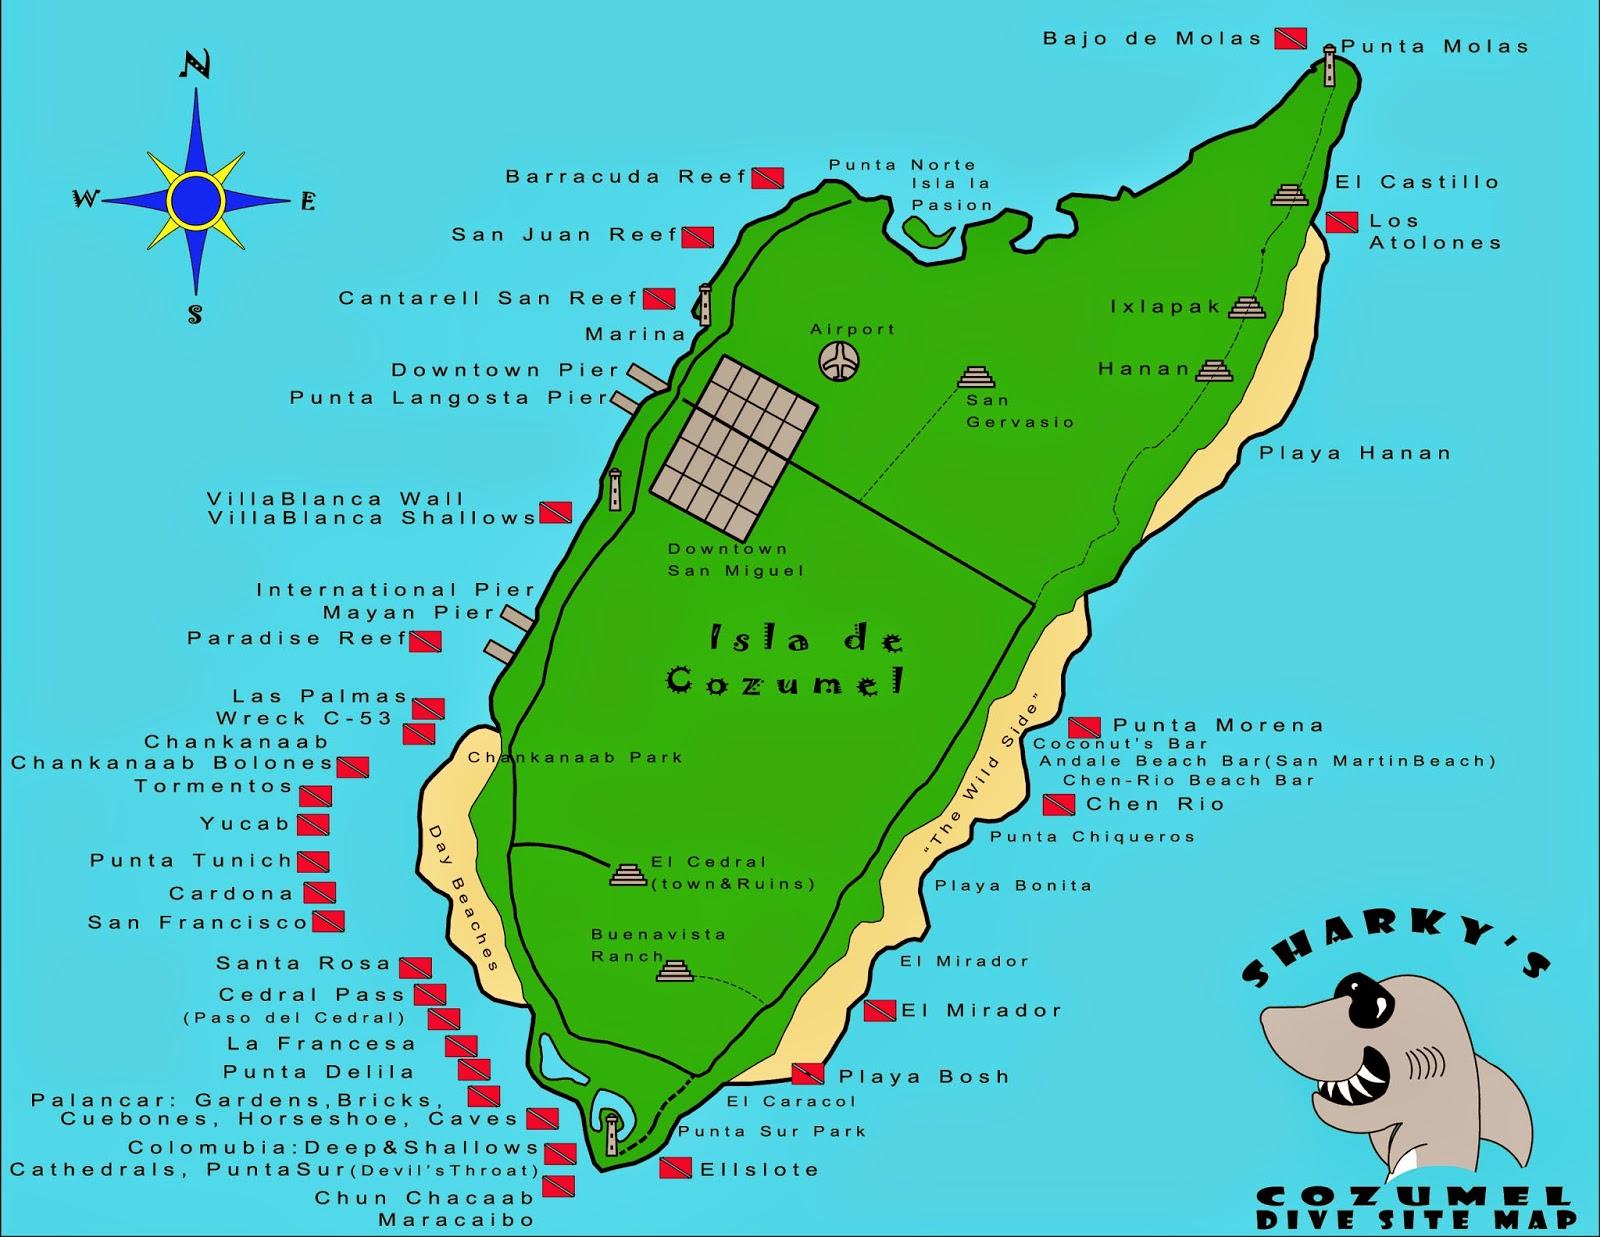 The shark tank radio show sharky 39 s cozumel dive site map - Cozumel dive sites ...